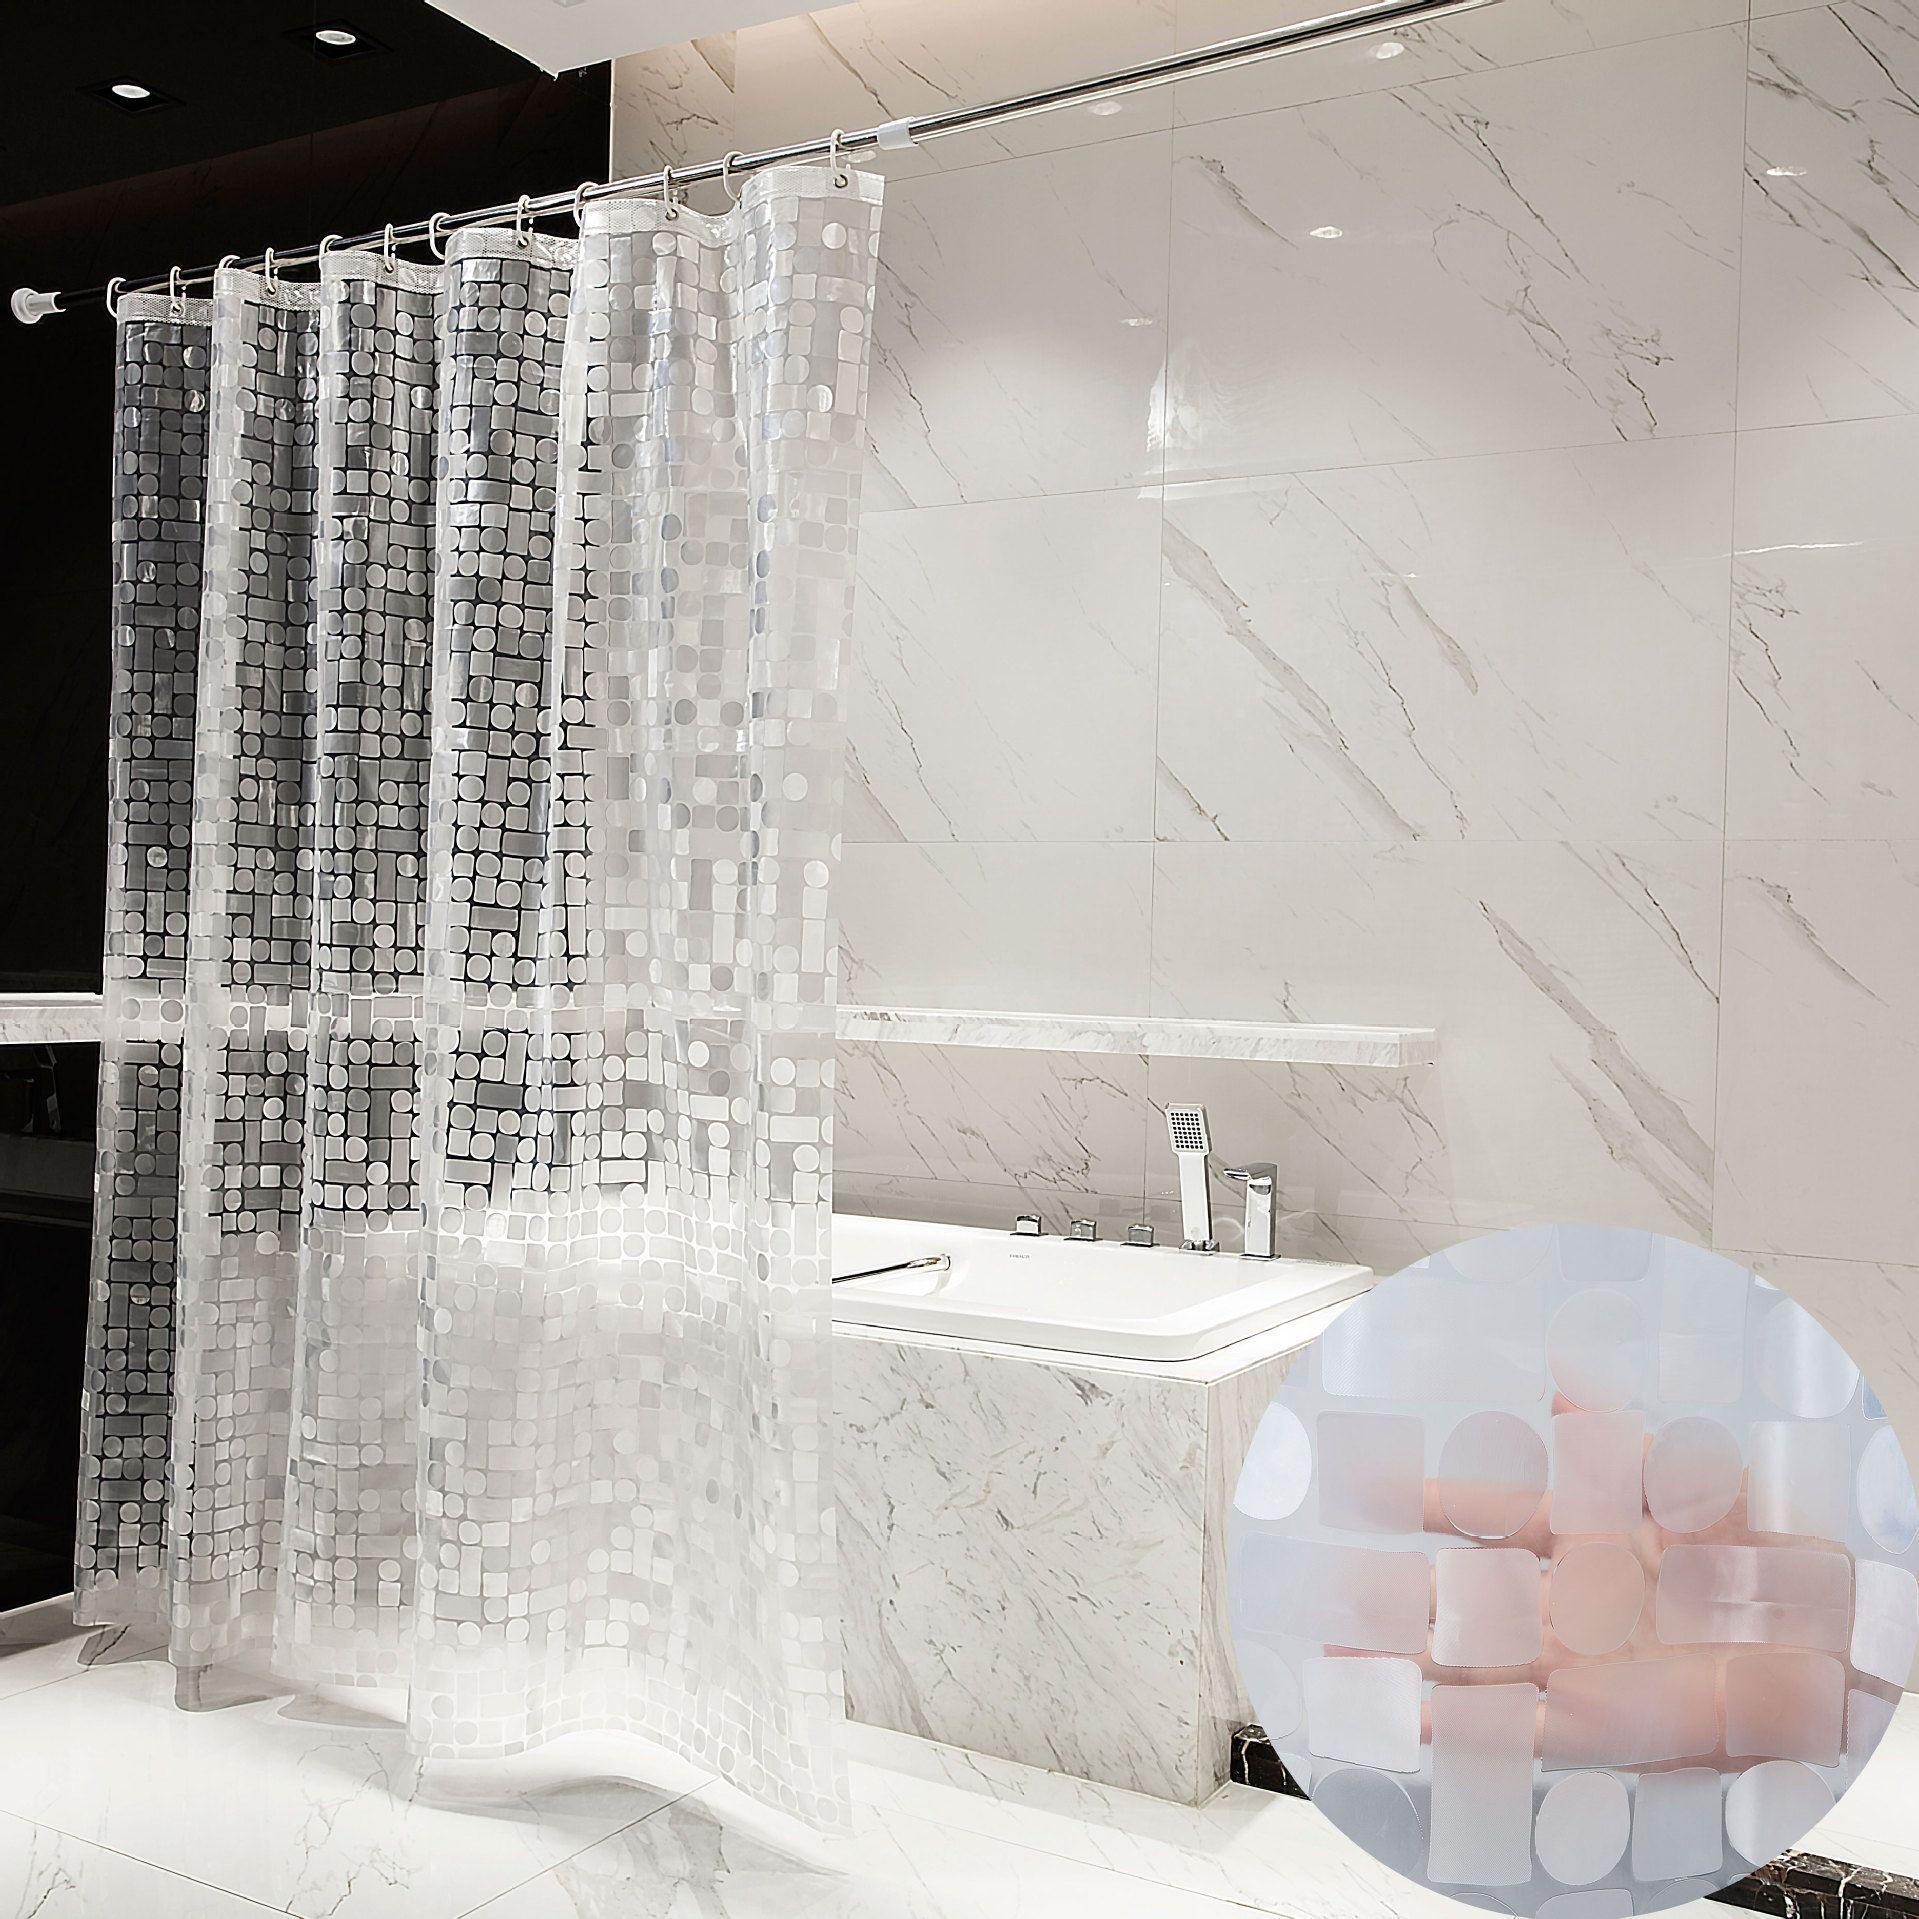 EVA للماء دش اينر سميكة العفن خالية الستار دش للحمام وصمة عار مقاومة دش اينر تصميم 3D نمط 72 × 72inch